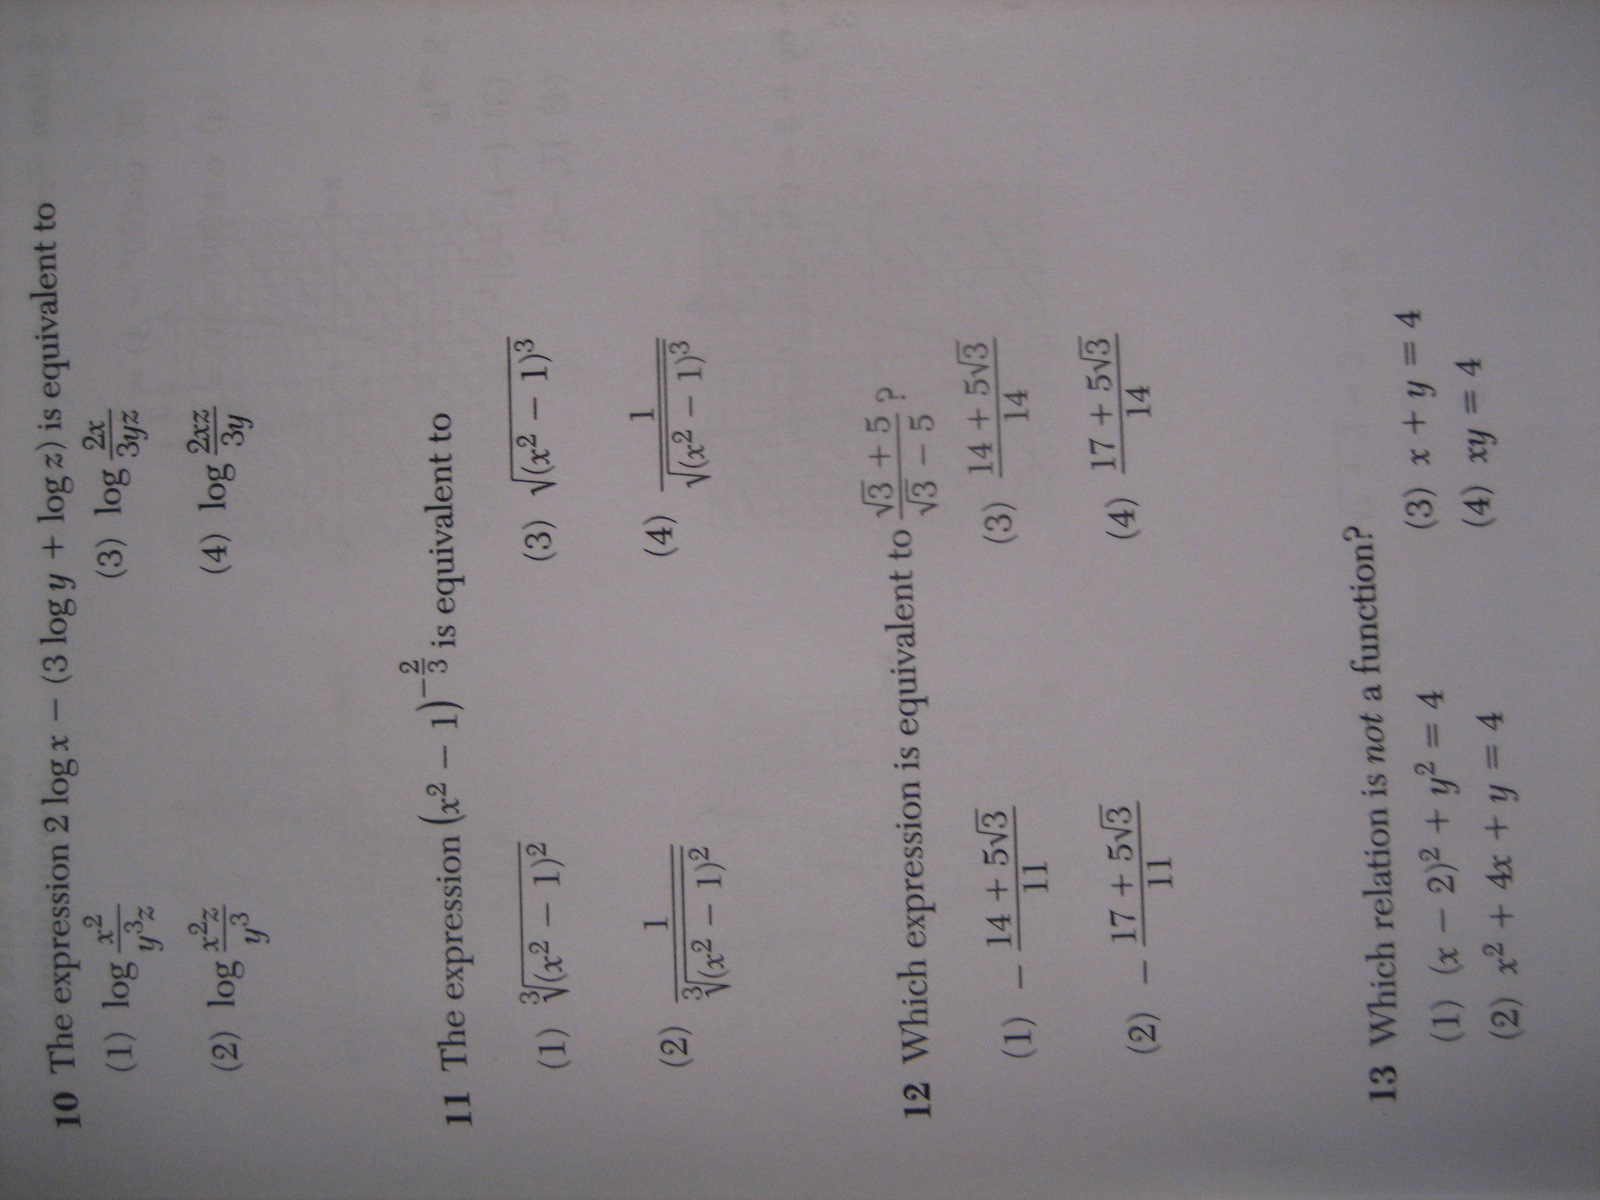 Algebra 2 Algebra 2 Trigonometry Regents Exam Answers